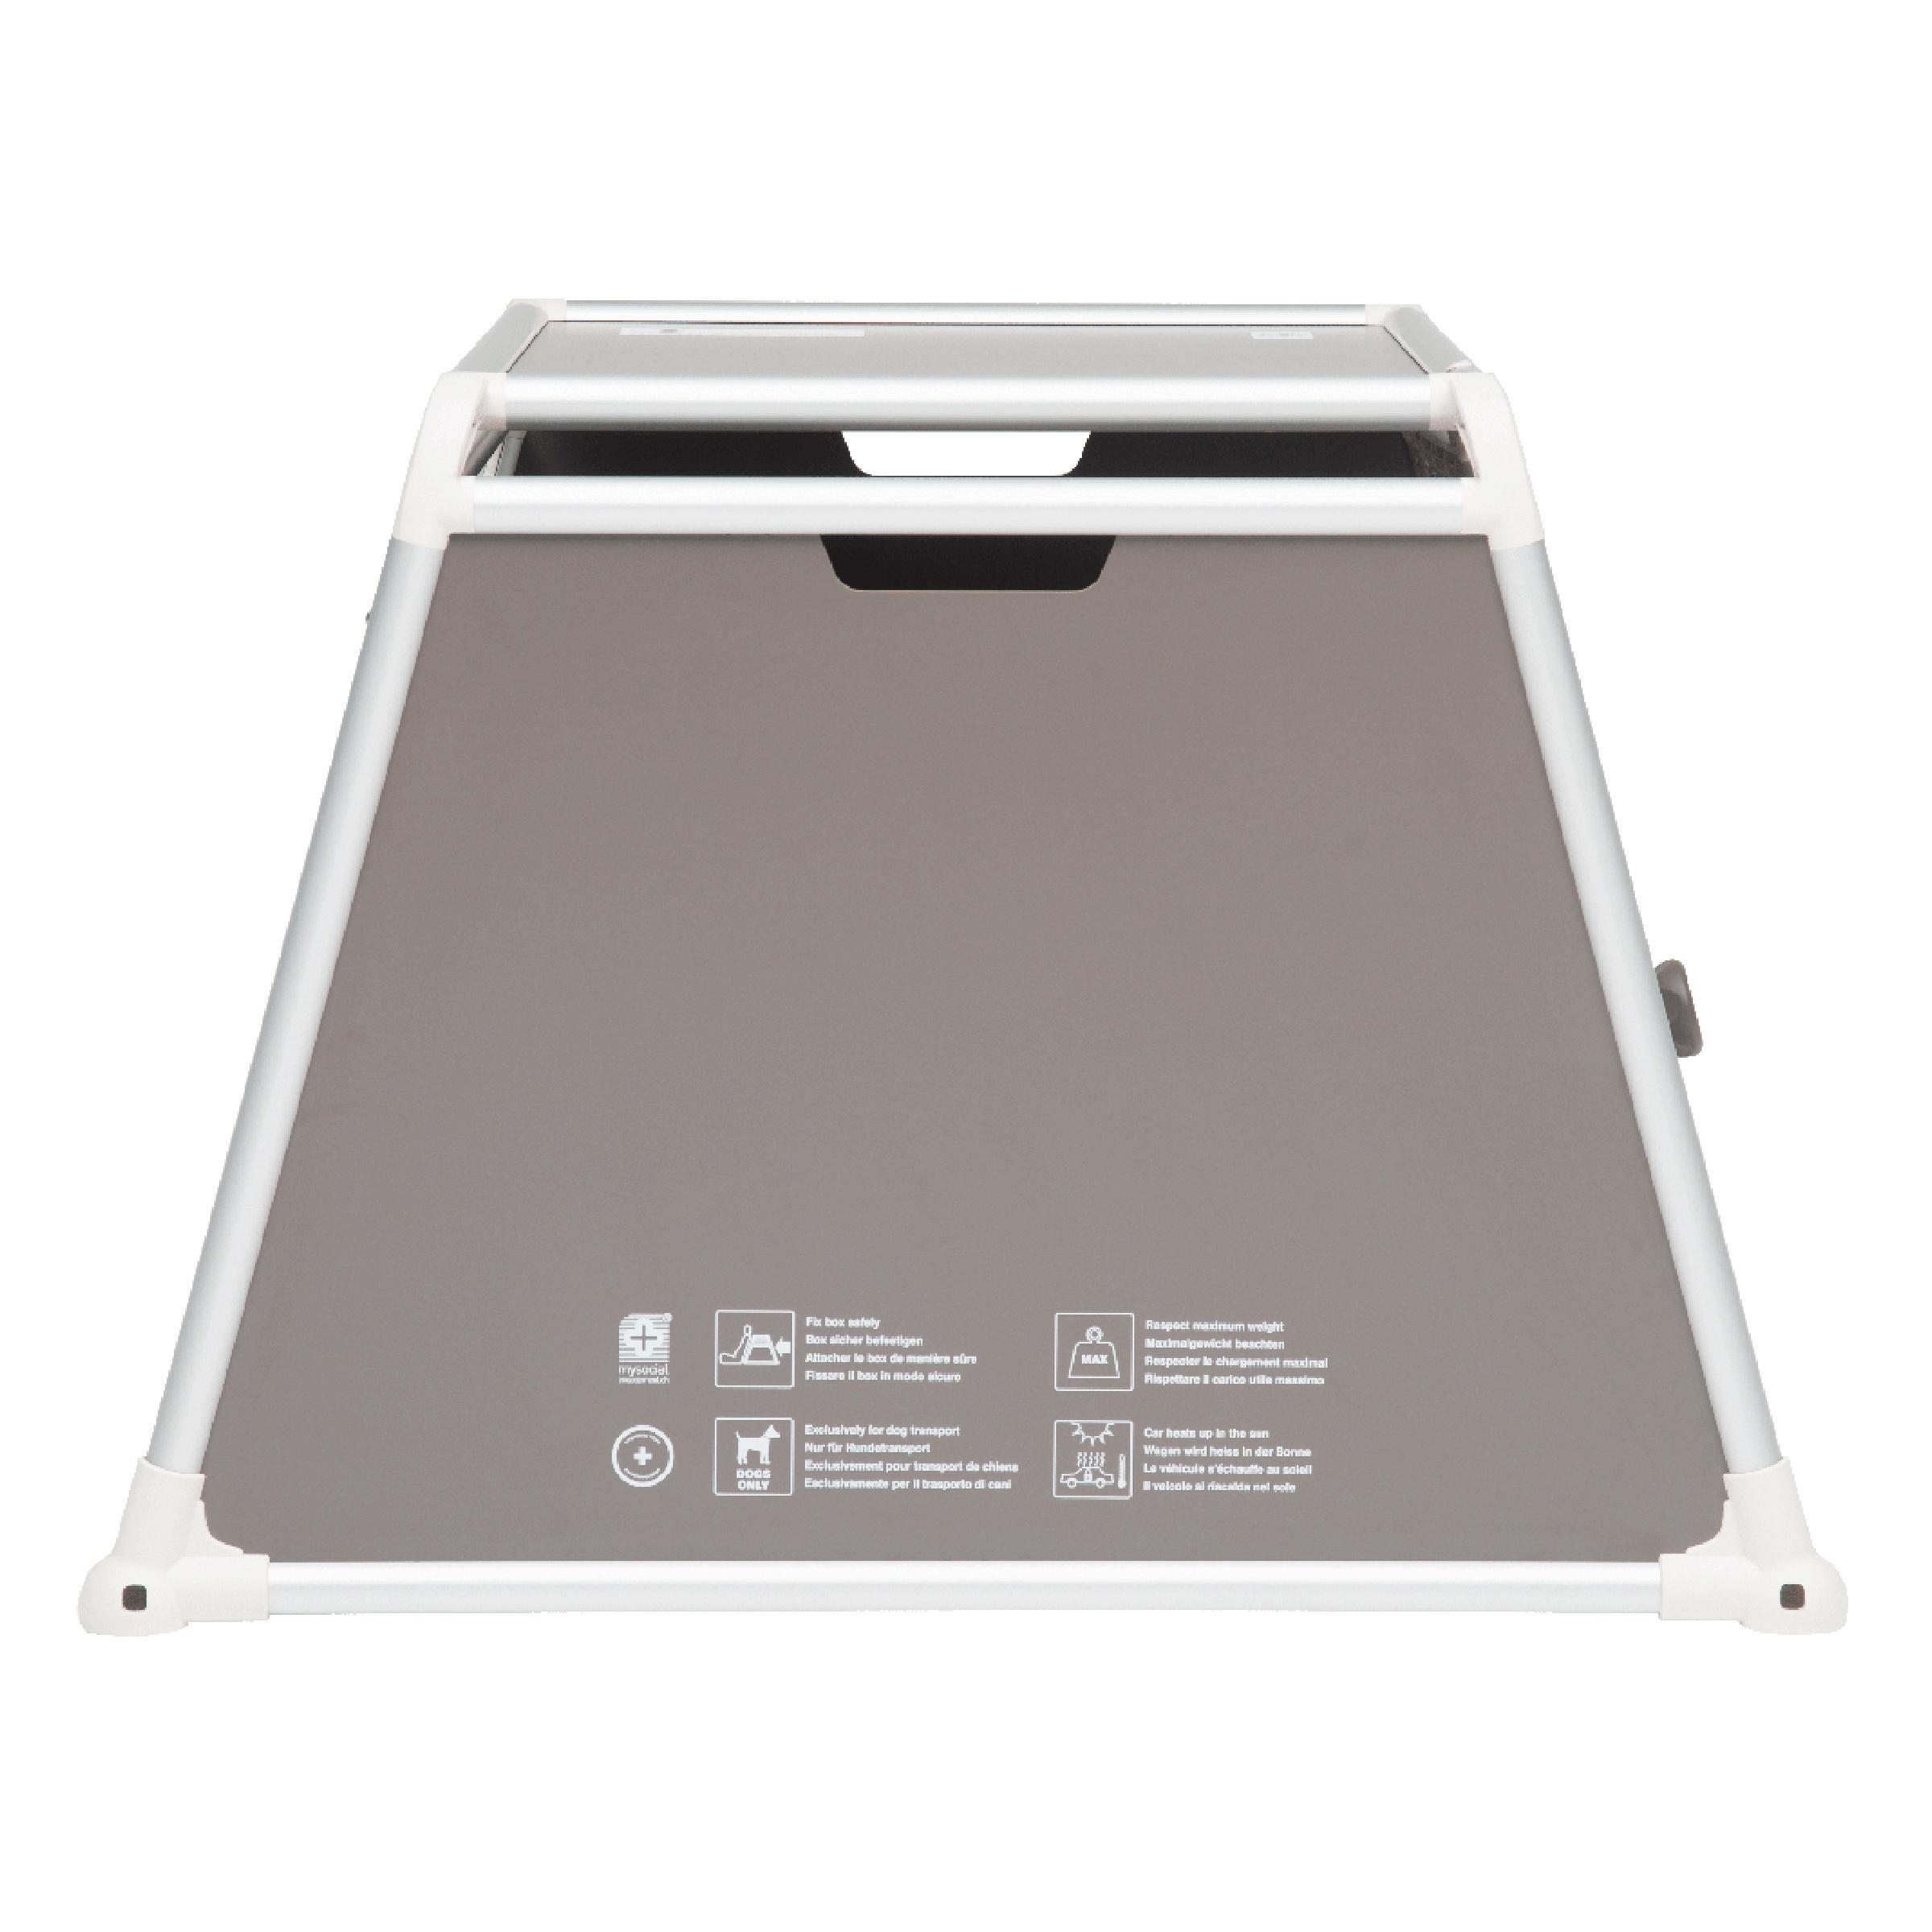 Image of 4pets Autobox ECO 4 Large 66x81.5x93.5cm